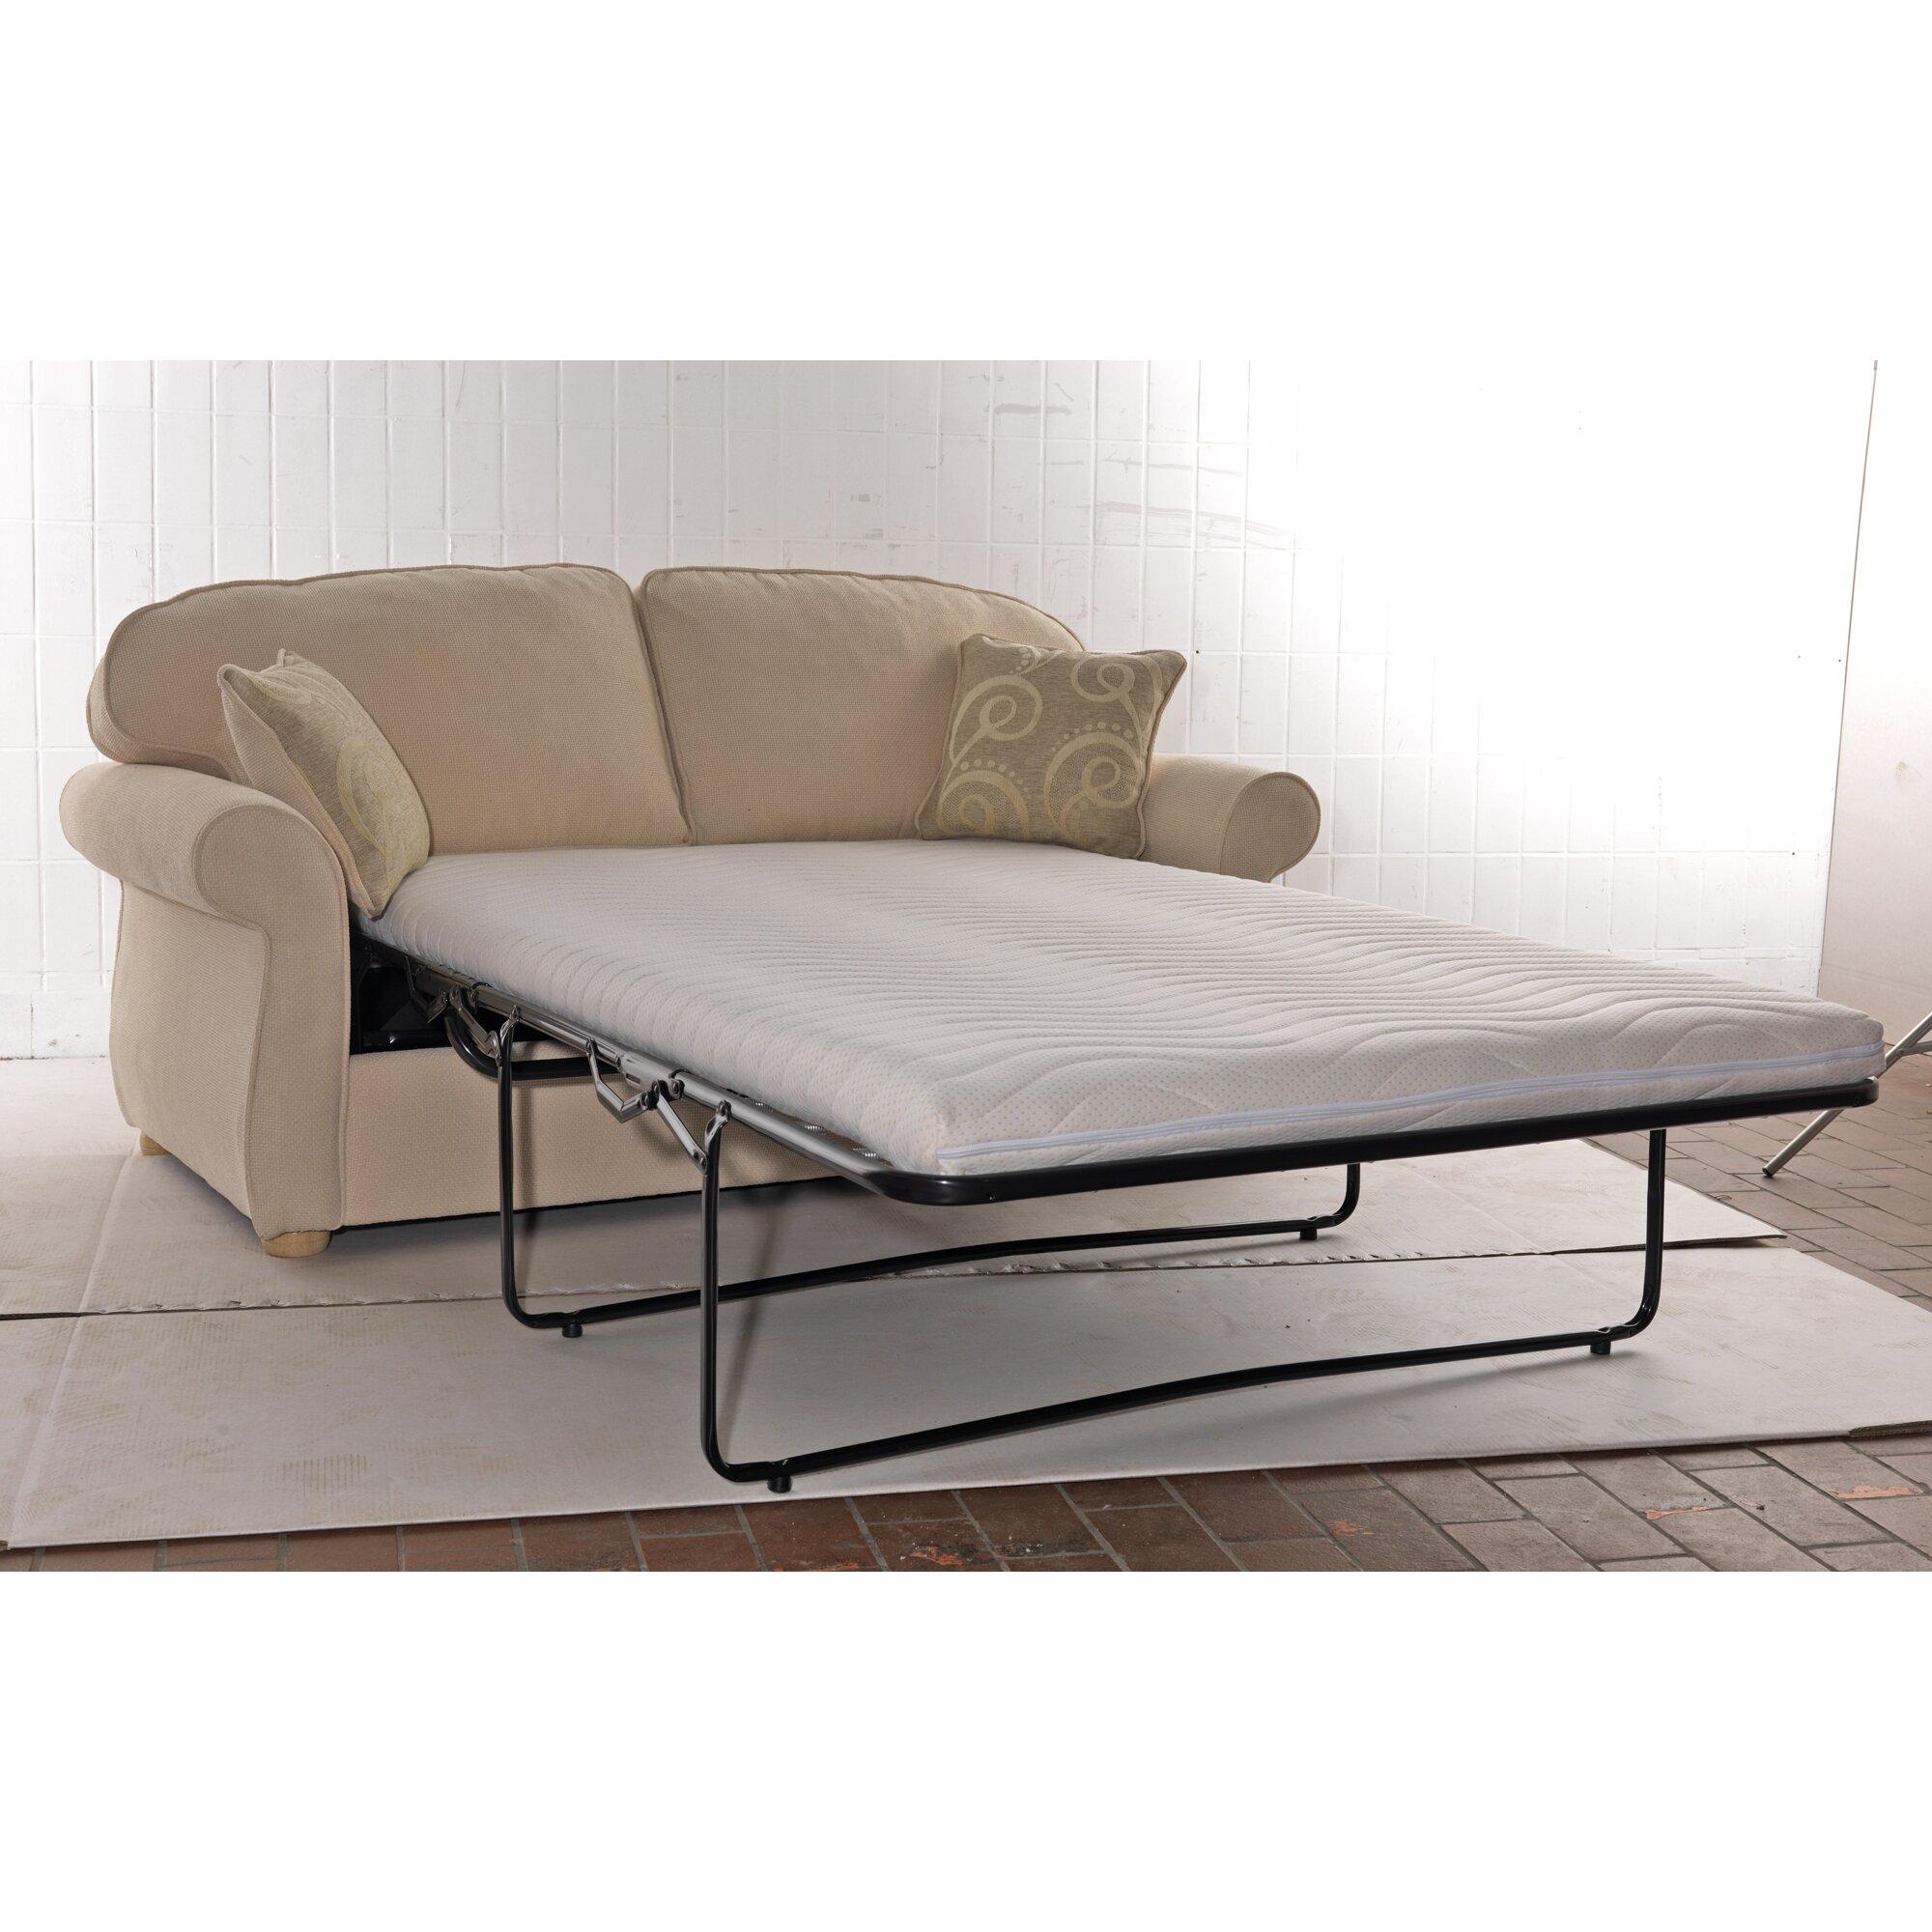 Folding Ottoman Guest Bed Sleeper With Mattress Amp